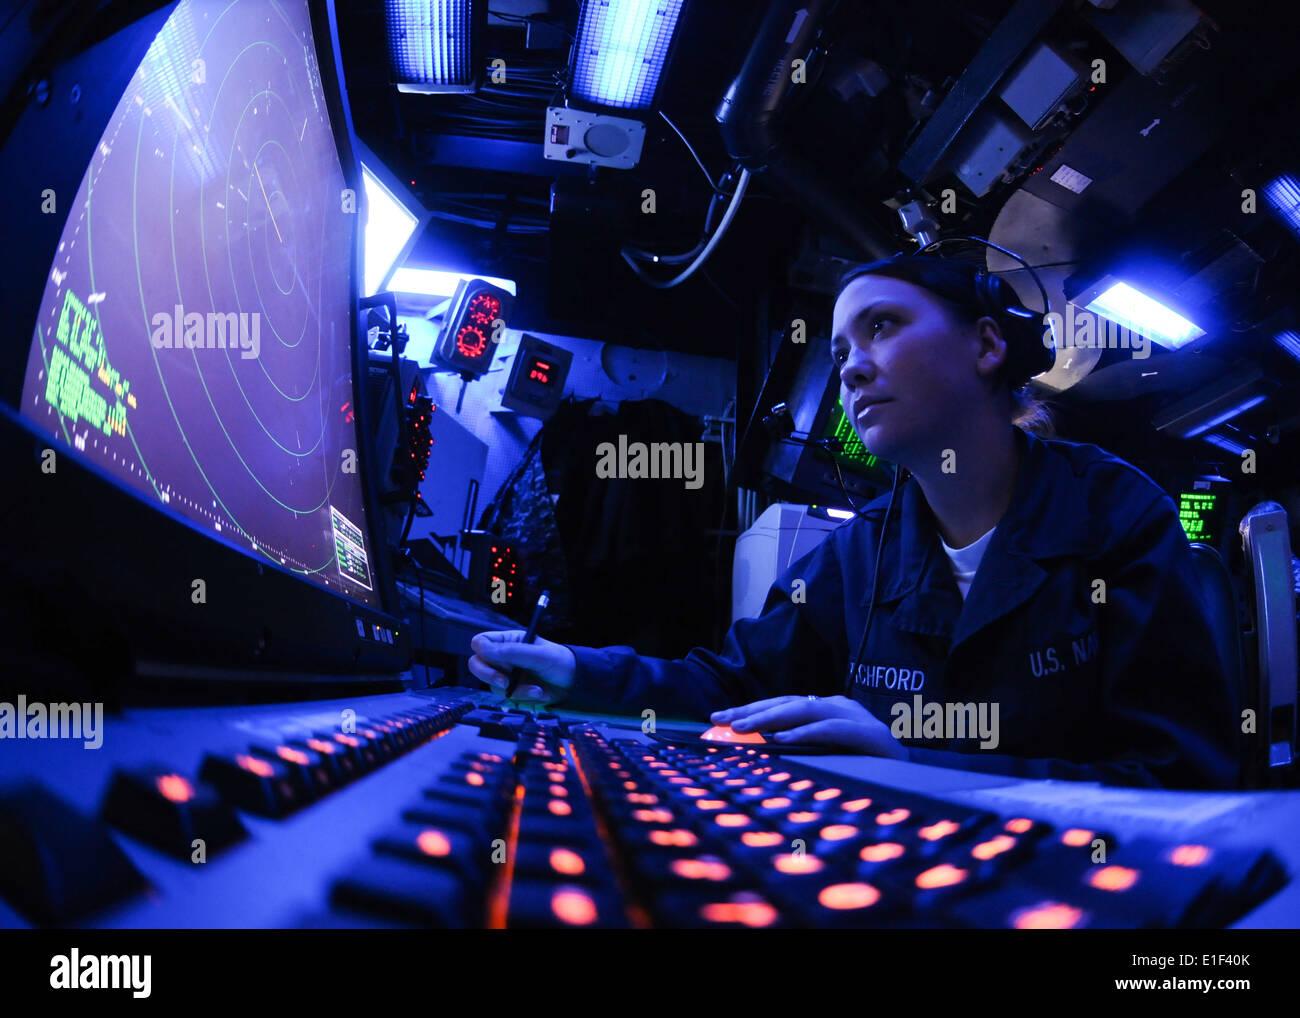 U.S. Navy Air Traffic Controller Airman Chelsea Pitchford monitors an air approach radar console in the air traffic control cen - Stock Image